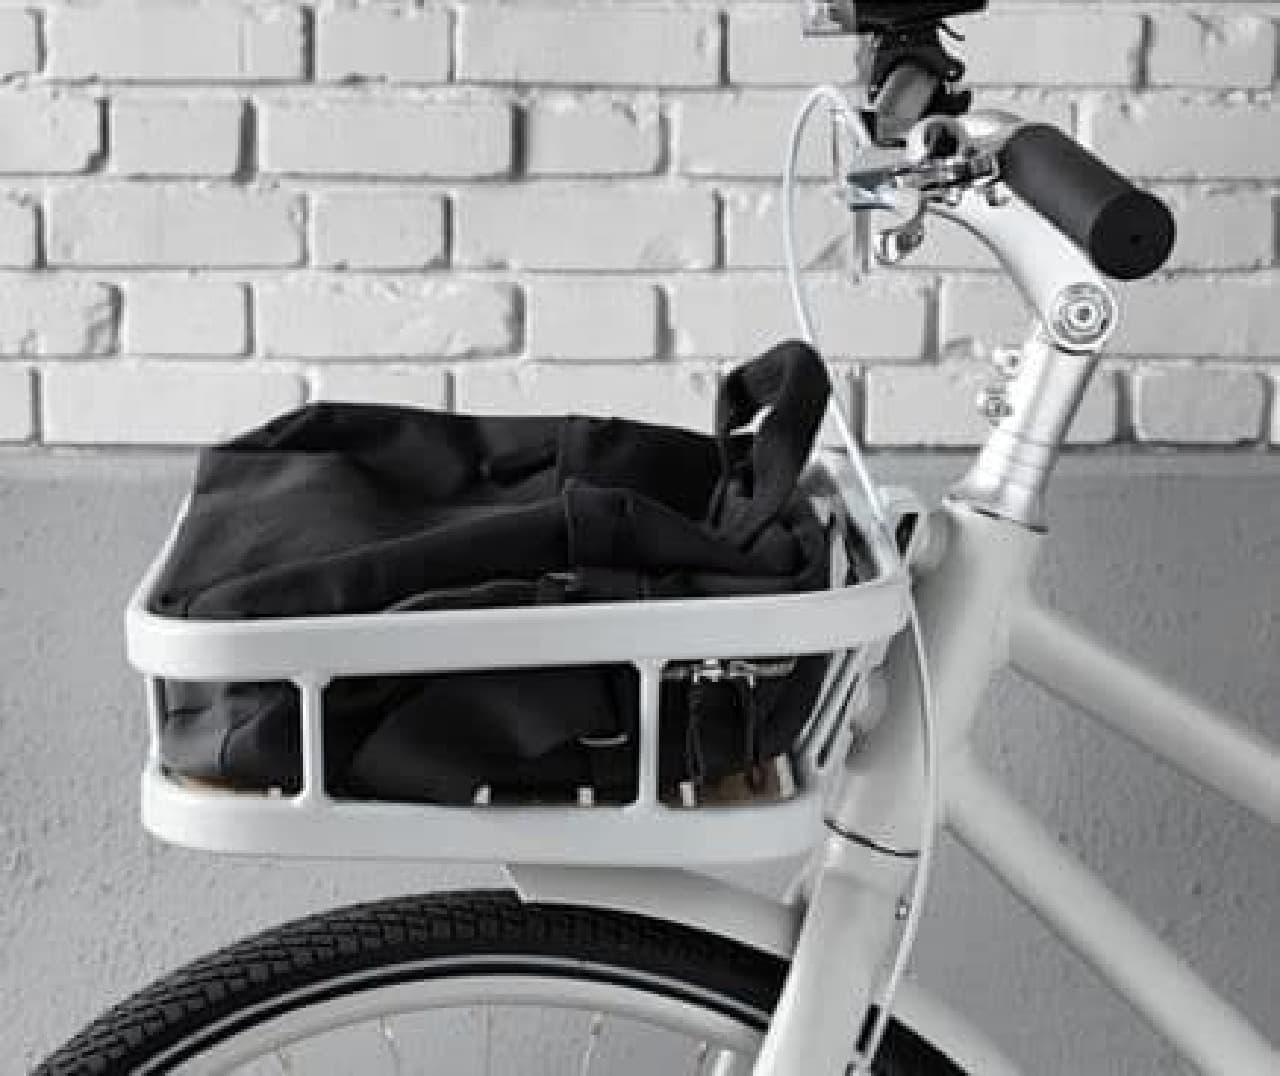 IKEAの自転車「SLADDA」、米国でも販売